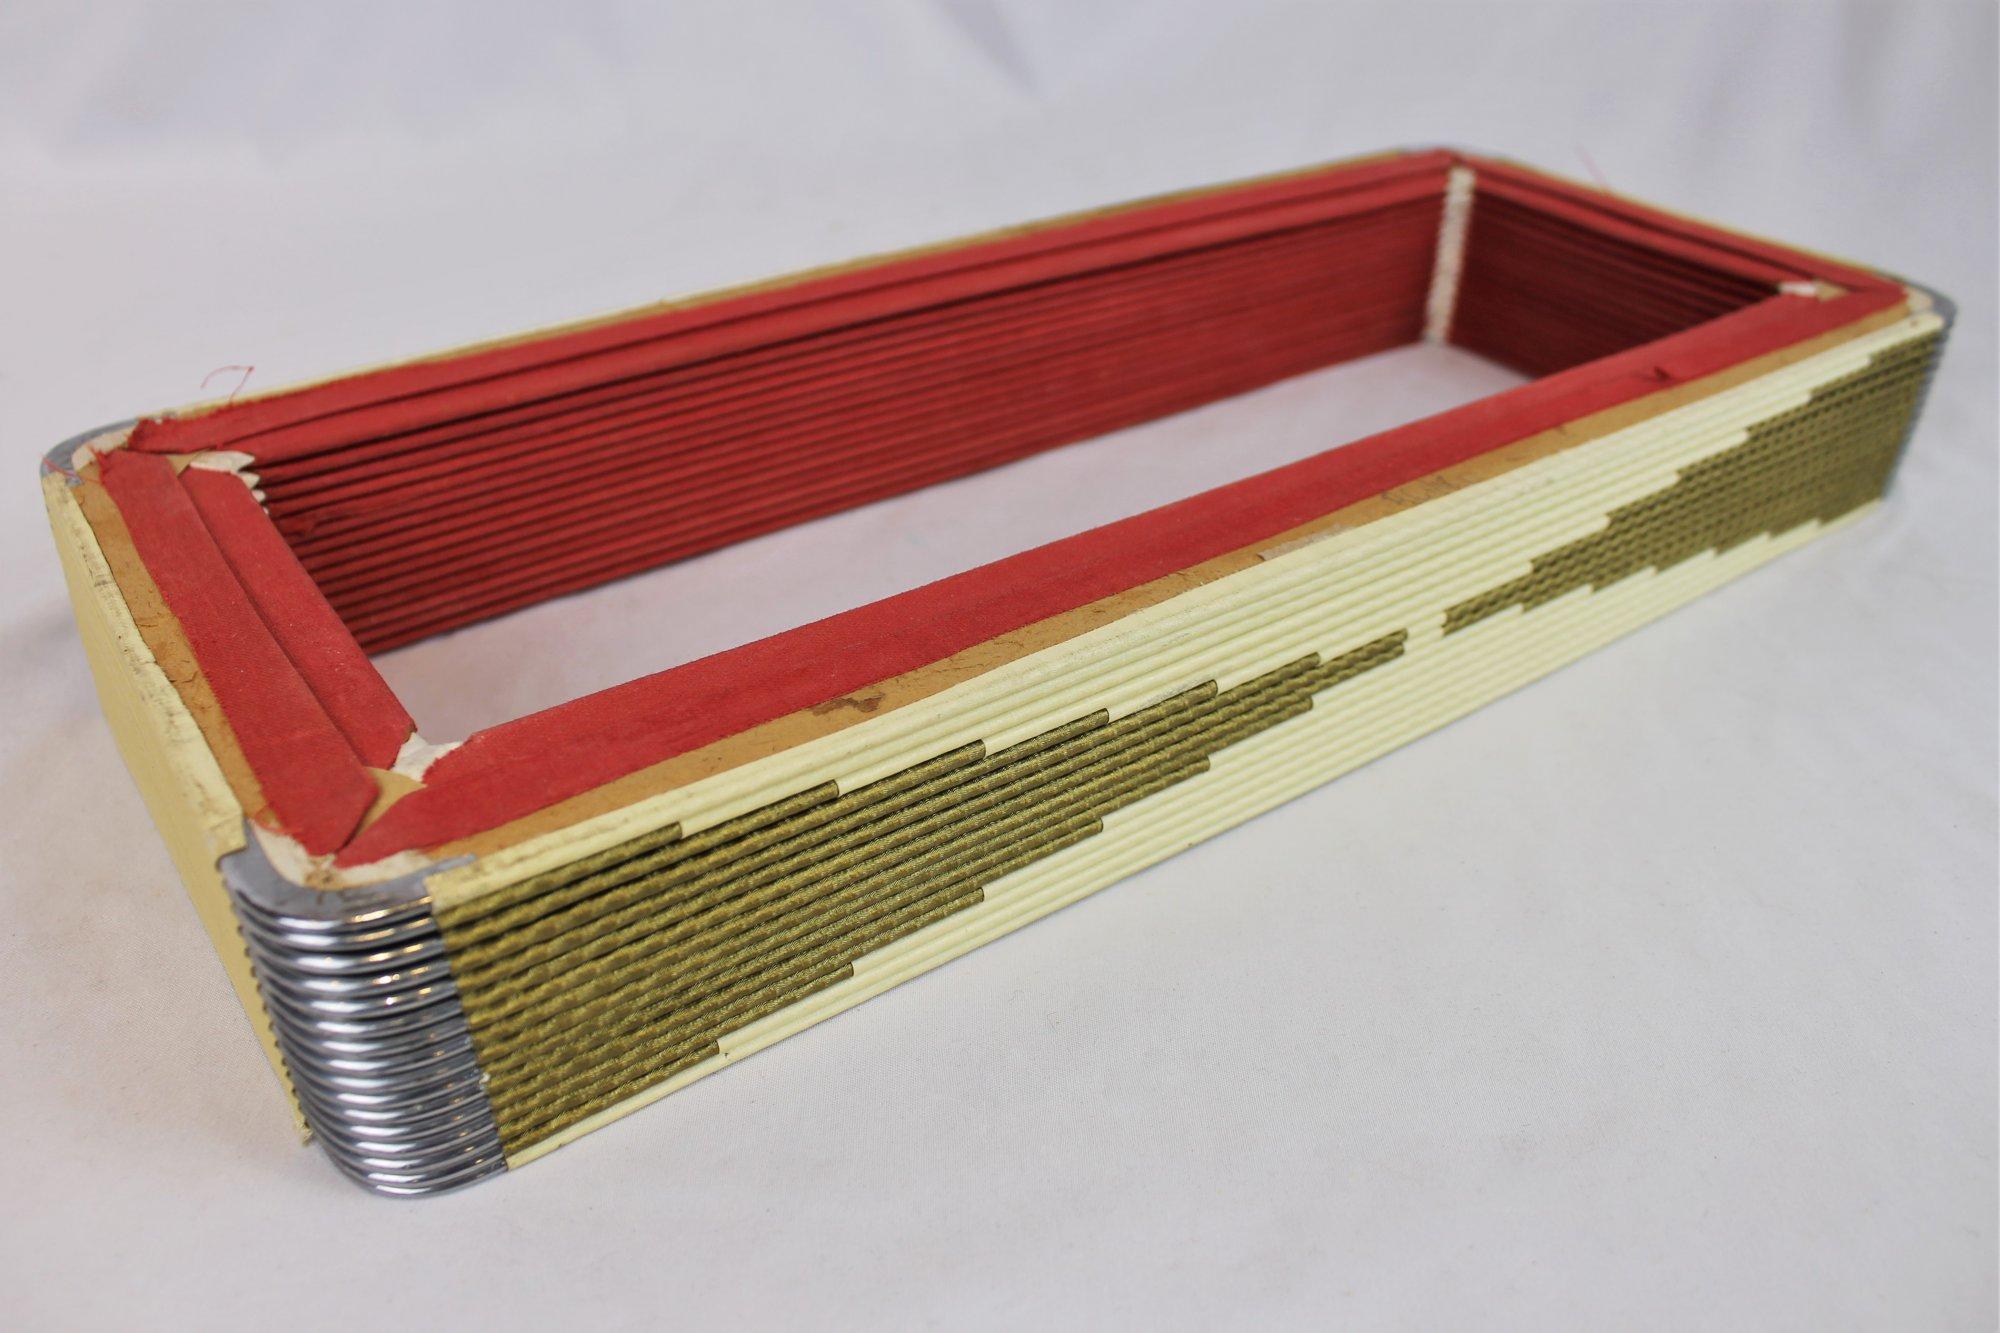 Accordion Part - Bellows 16 x 6.75 x 2 16 Folds